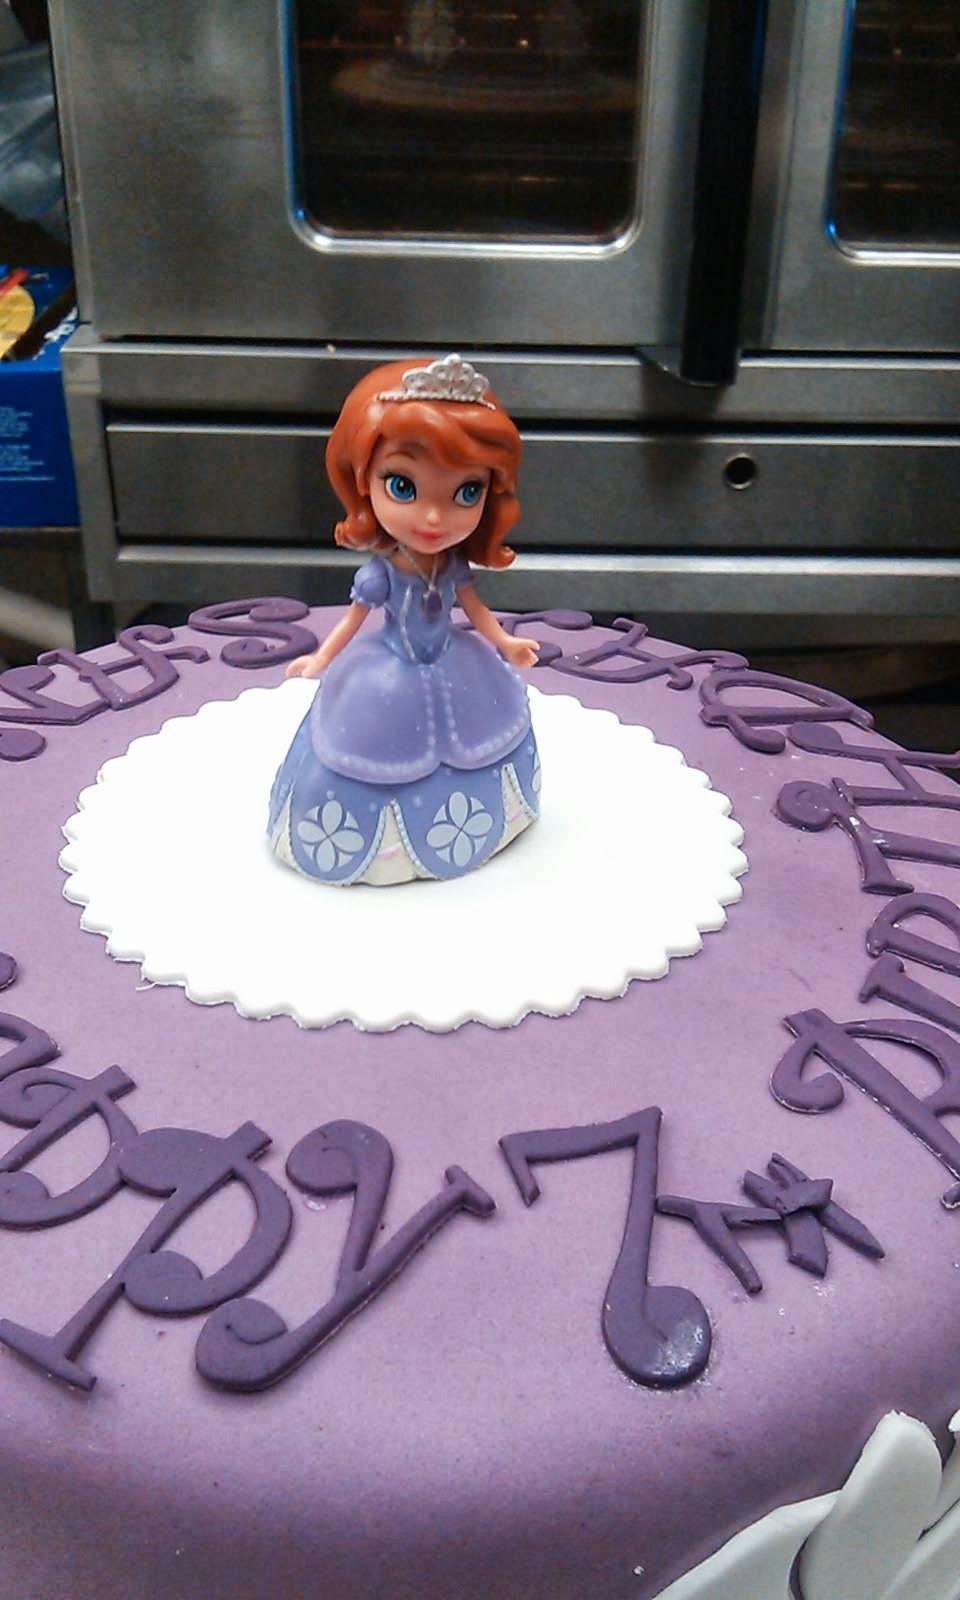 Cake Art Lawrenceville Hwy : CAFE AROMAS: Princess Sofia Cake